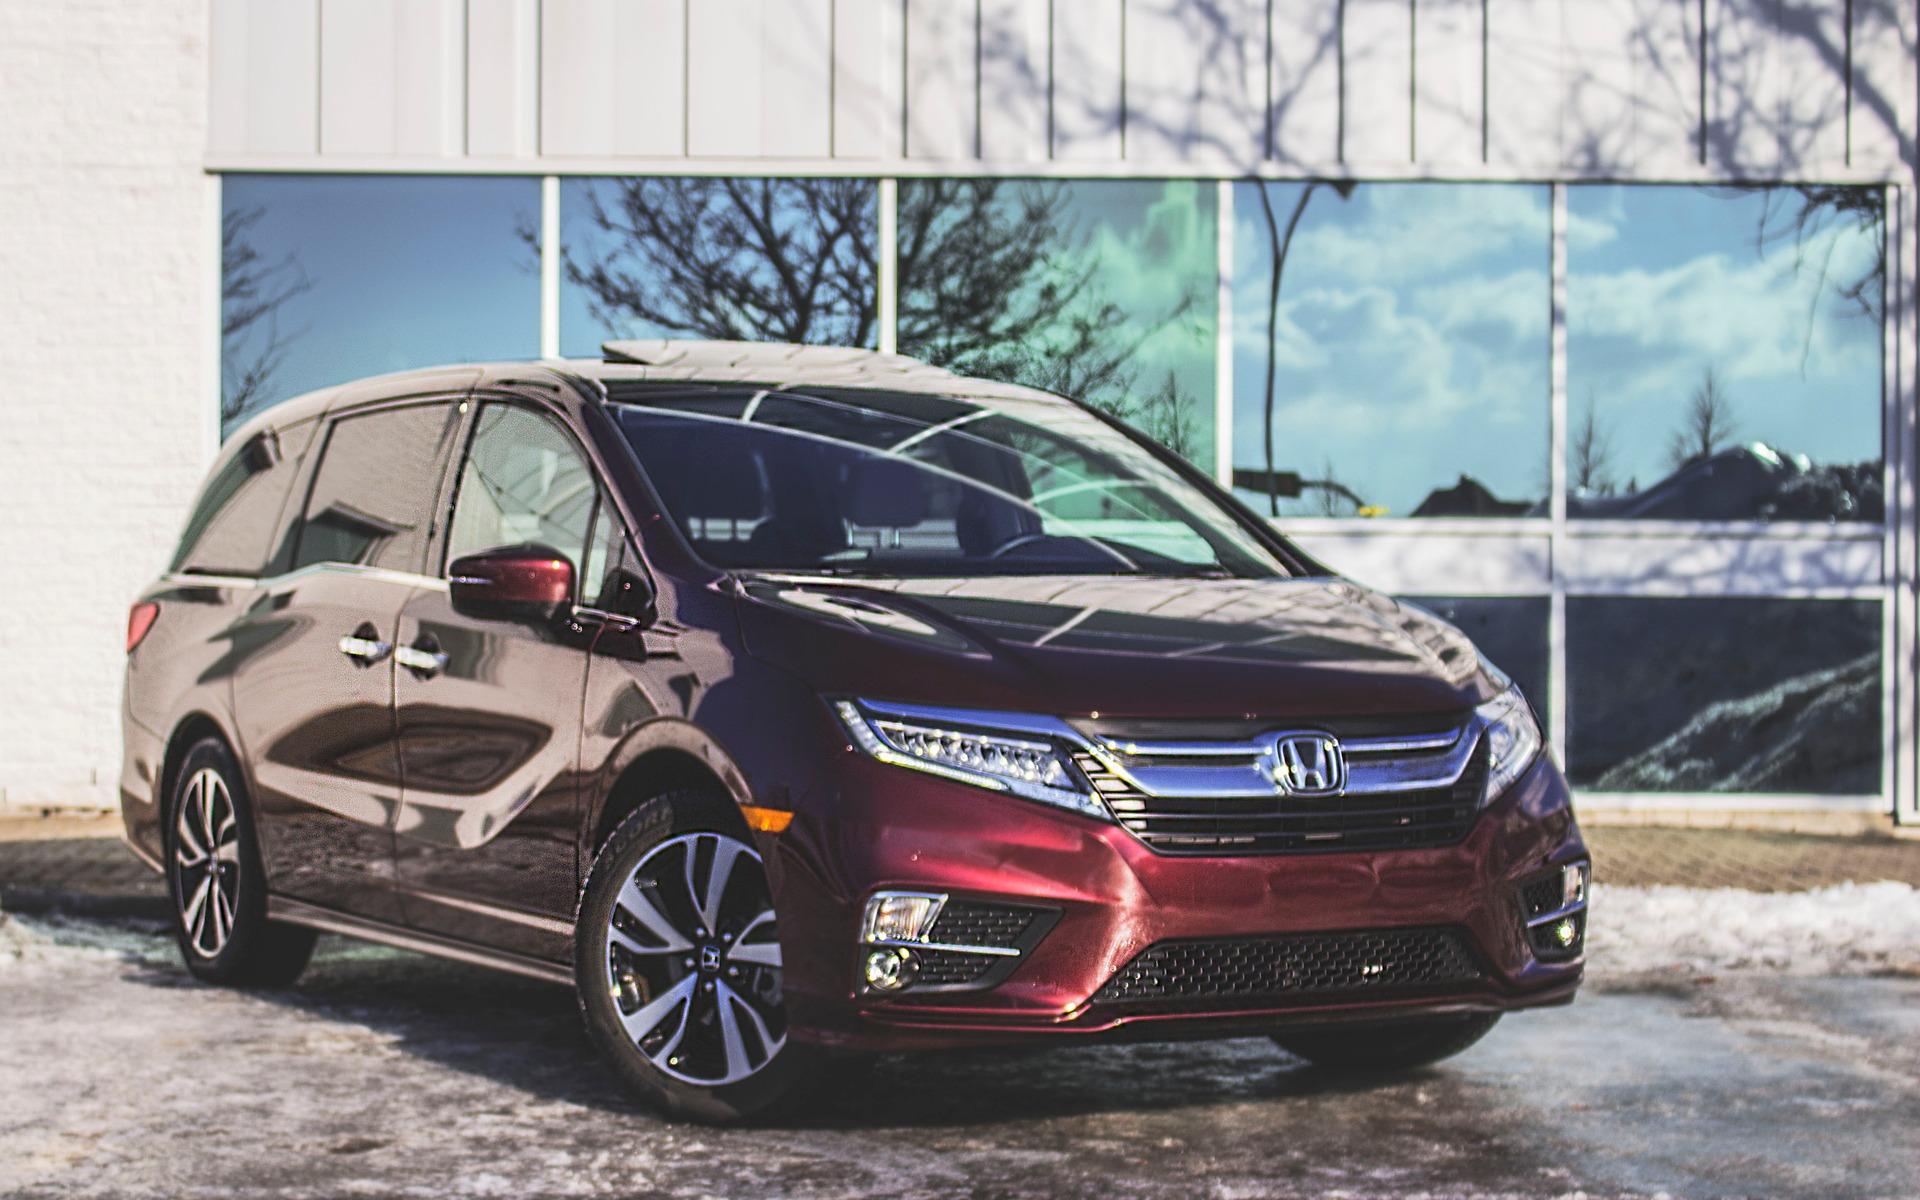 2018 Honda Odyssey A Nod To Simpler Era The Car Guide Fuel Pump Unit In